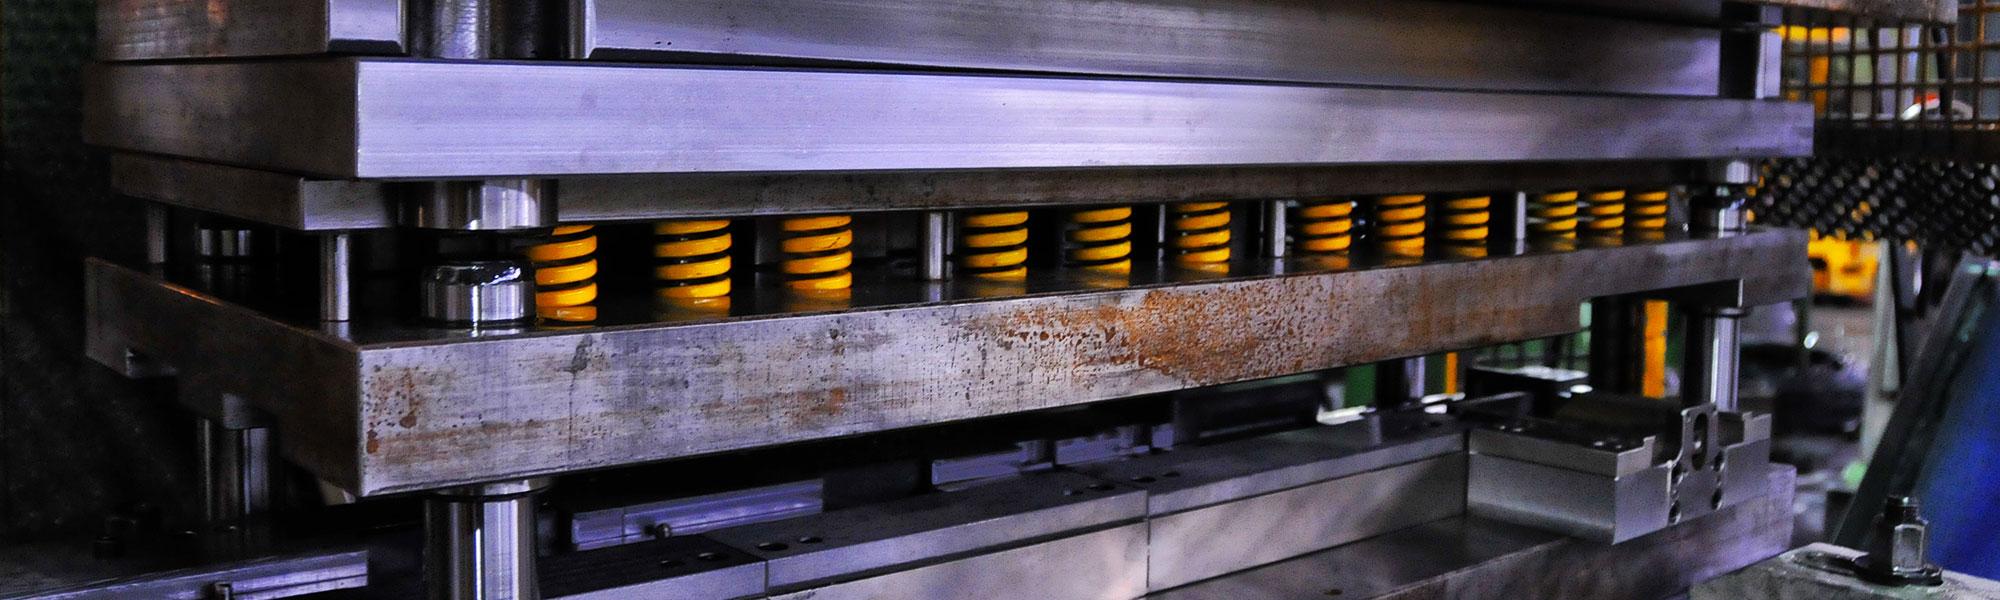 tranciatura metalli e lamiere